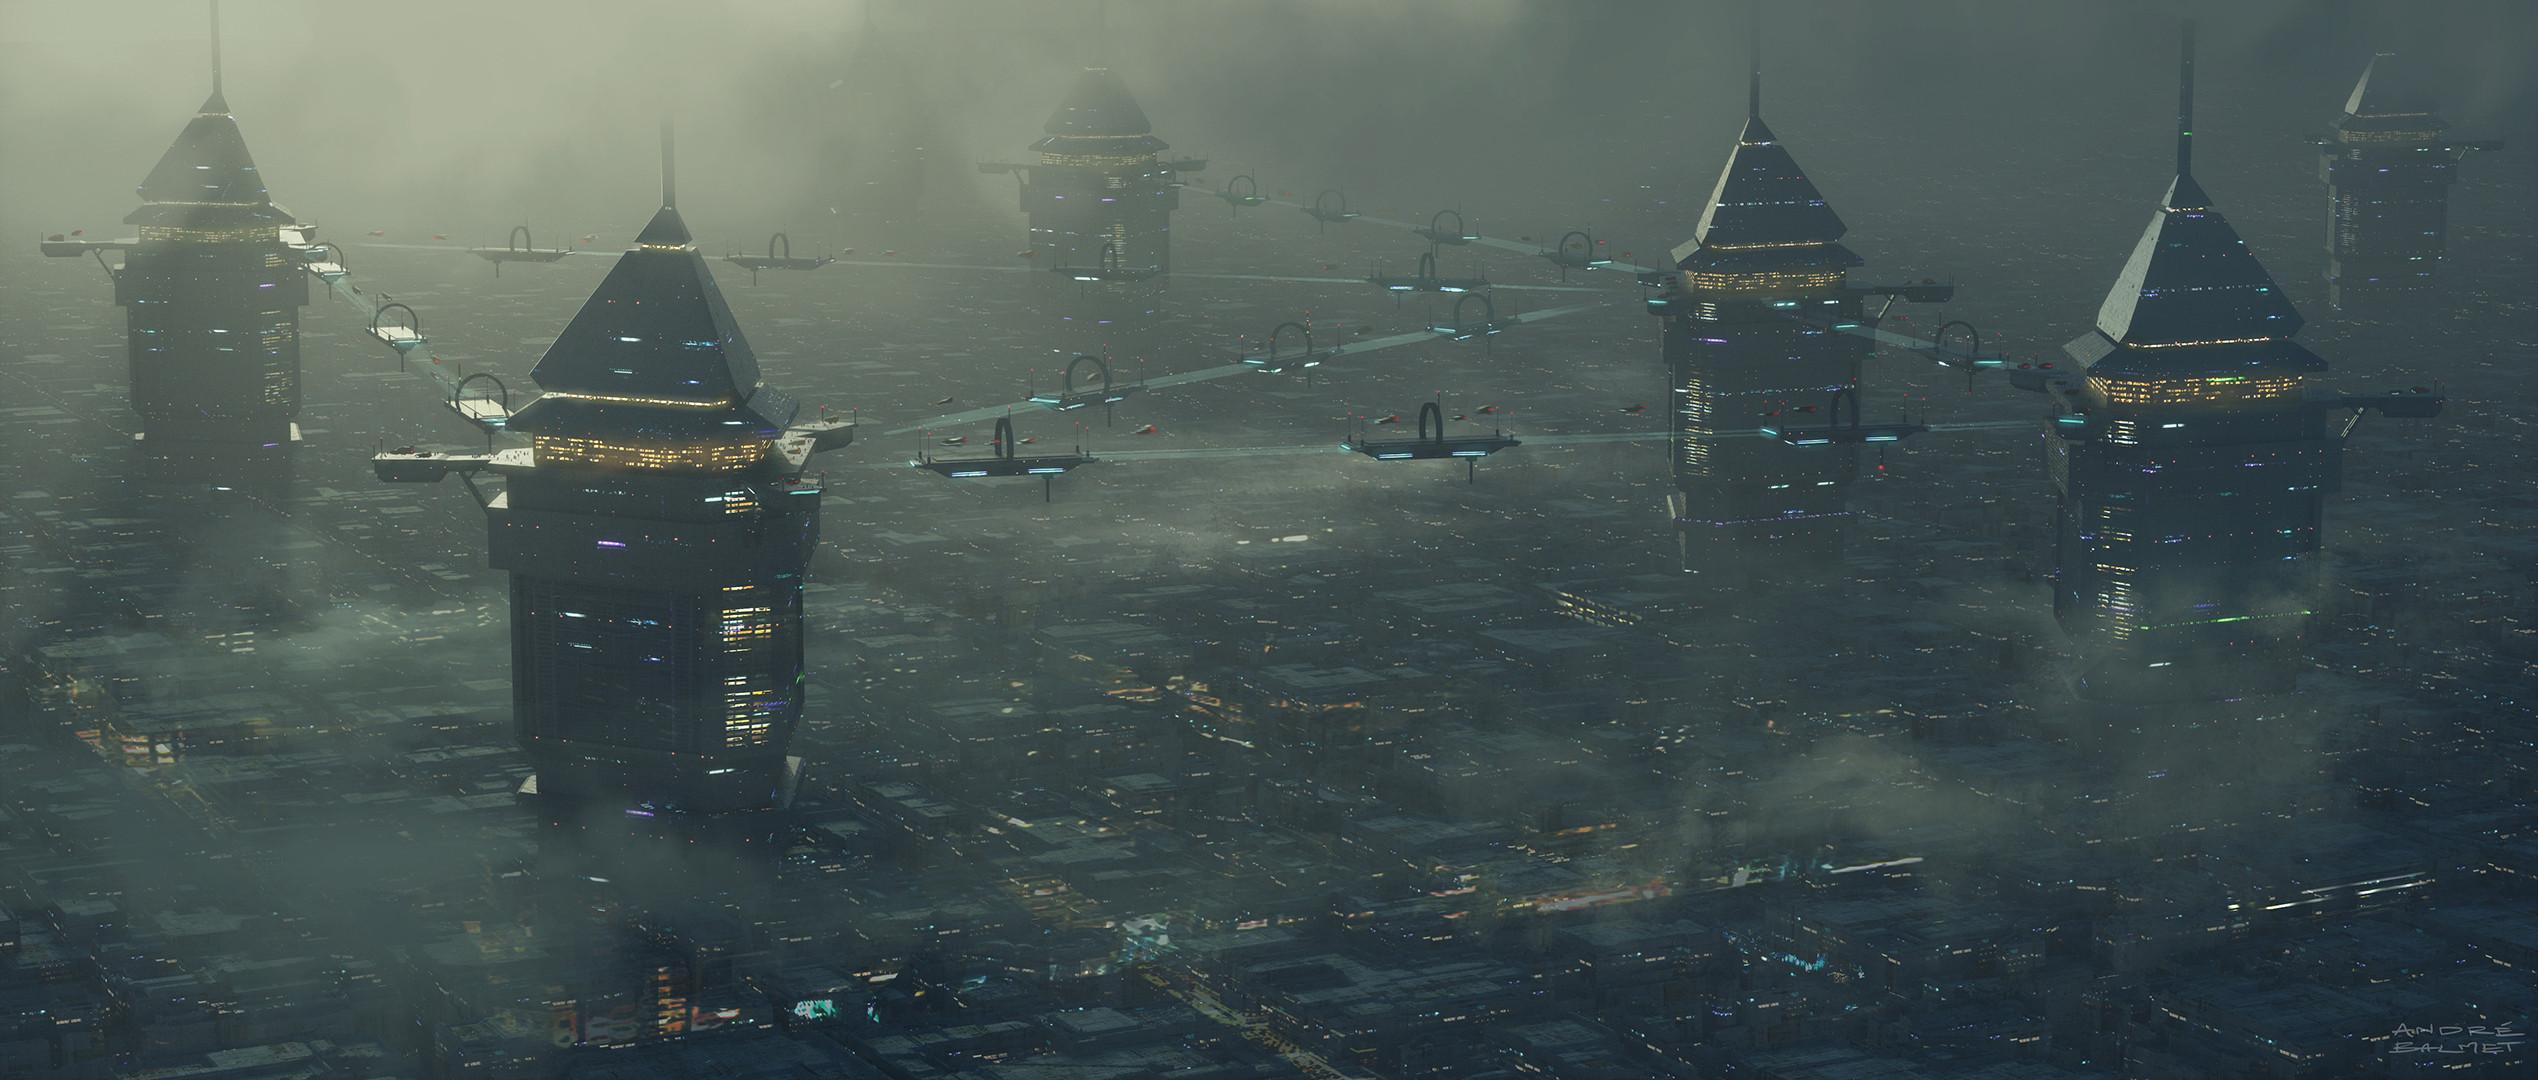 SciFi Future City worldbuilding design photoshop 3d